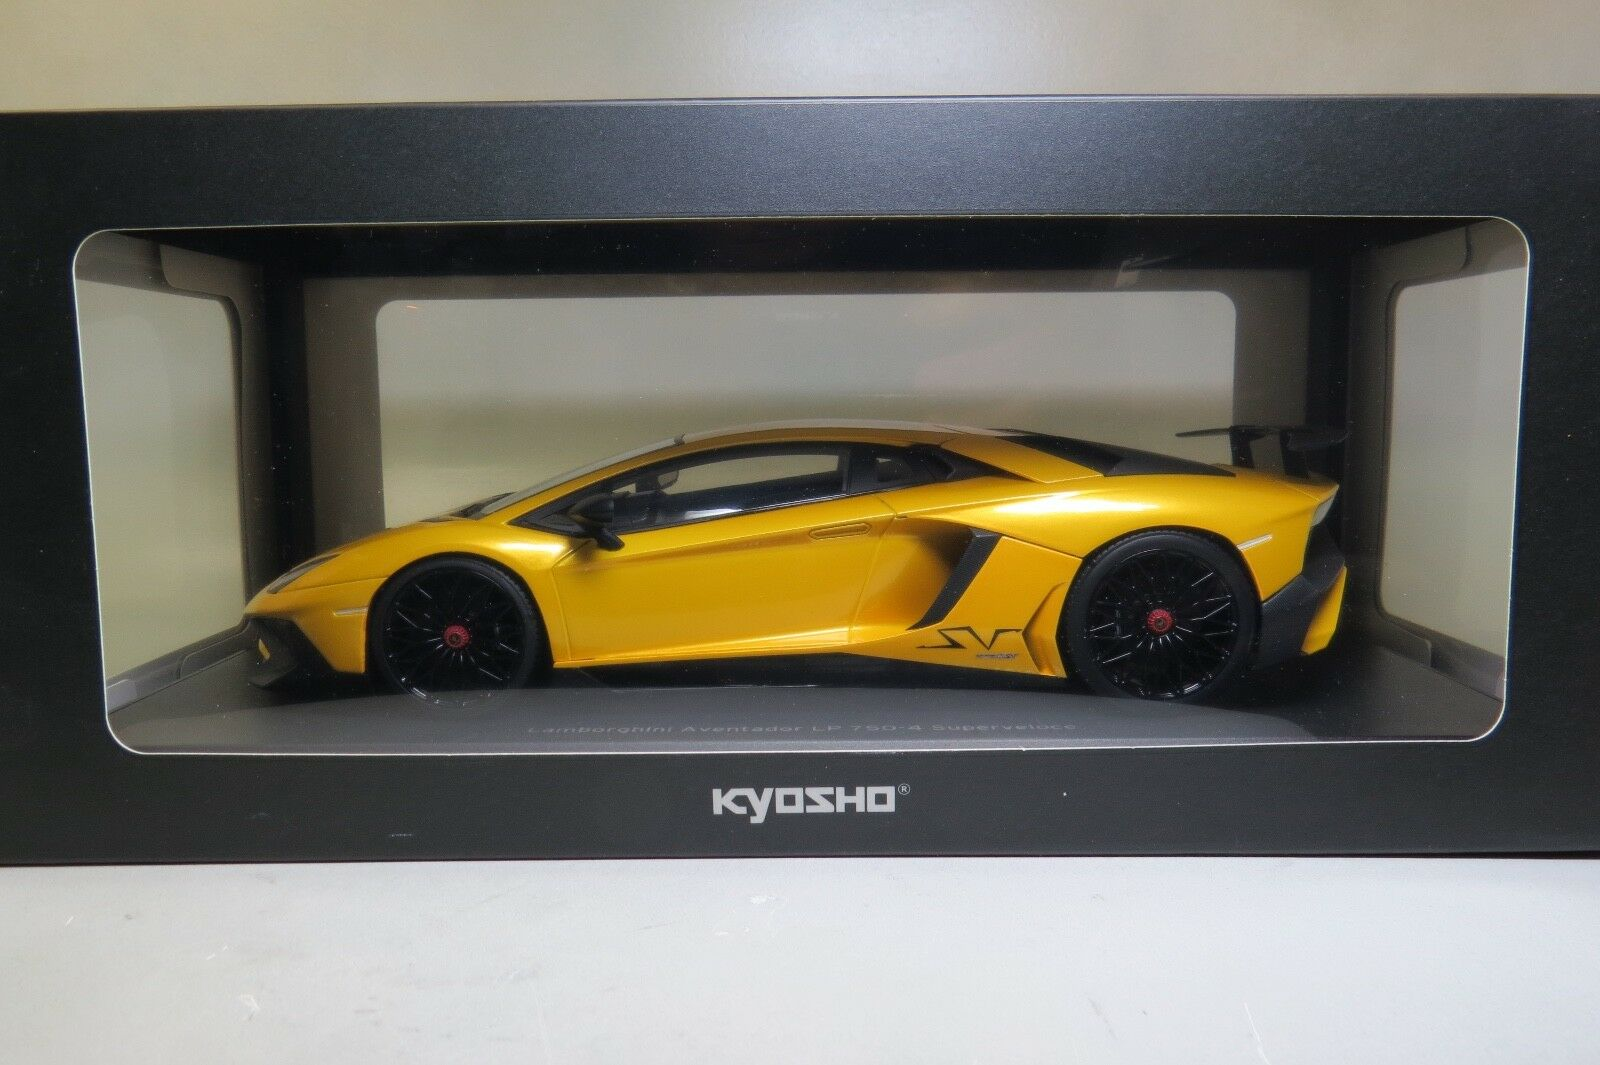 Kyosho 1 18 Scale C09521Y Lamborghini Aventador LP 750-G Superveloce Yellow